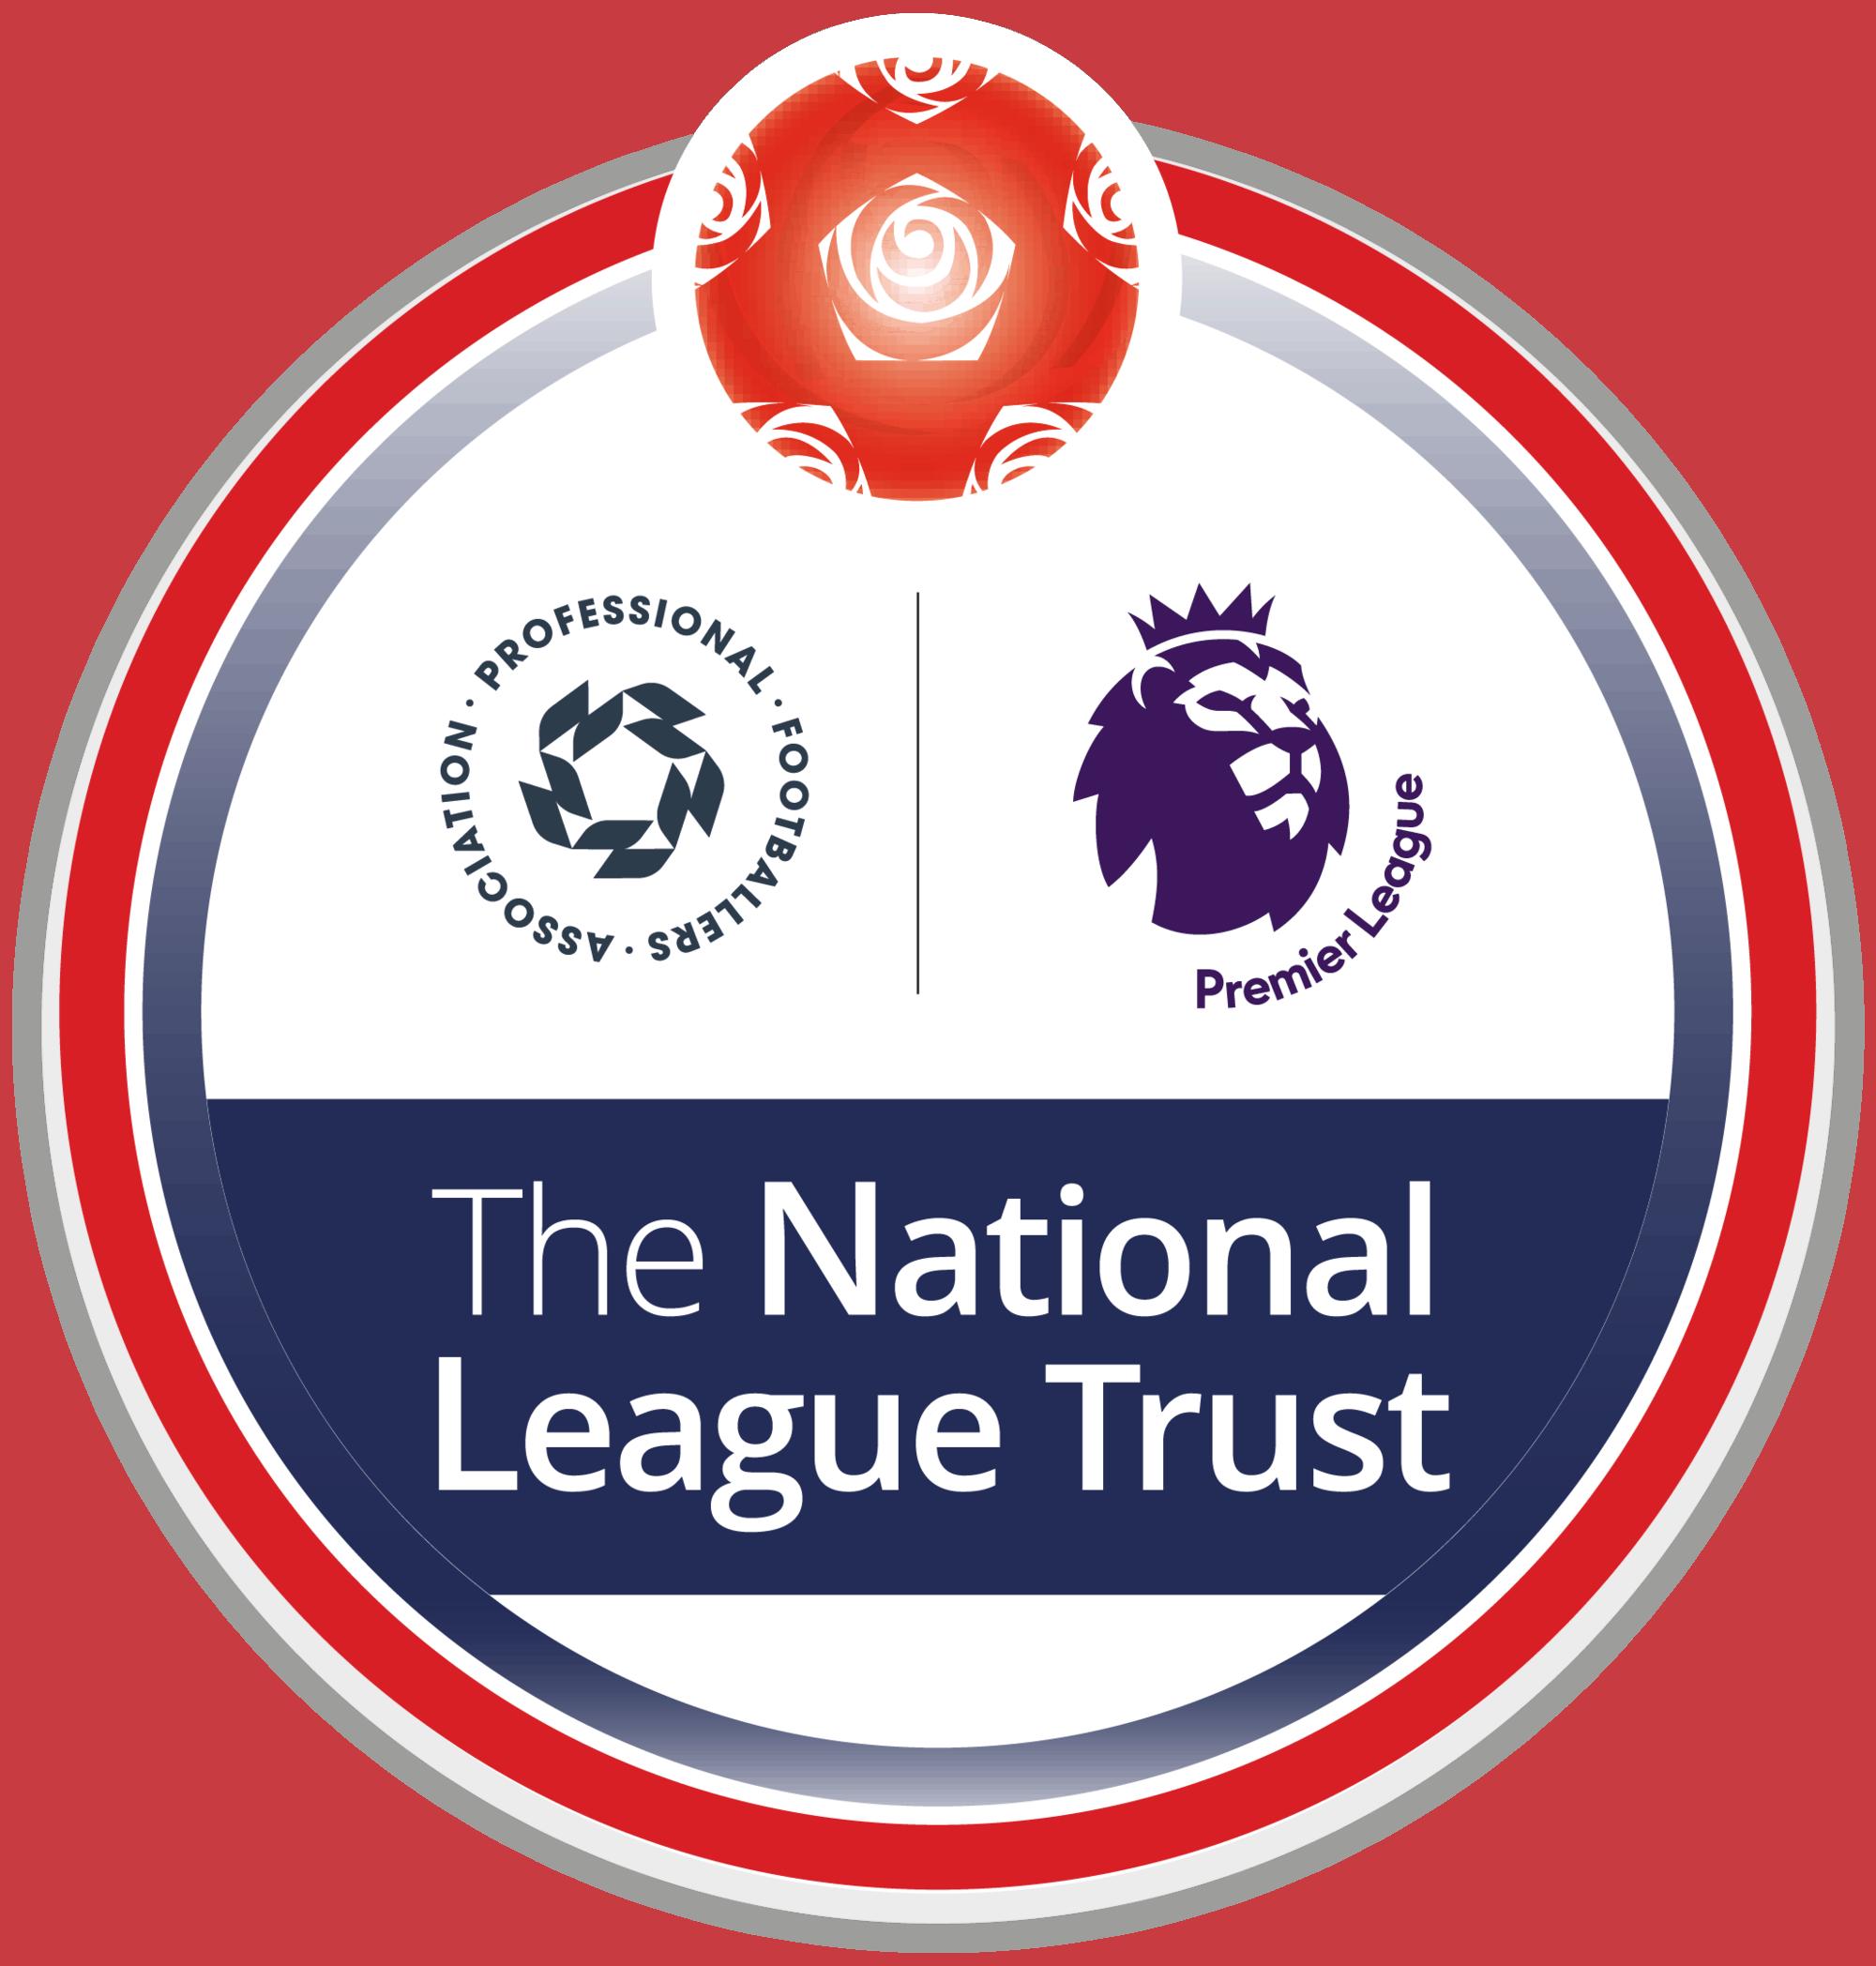 National League Trust